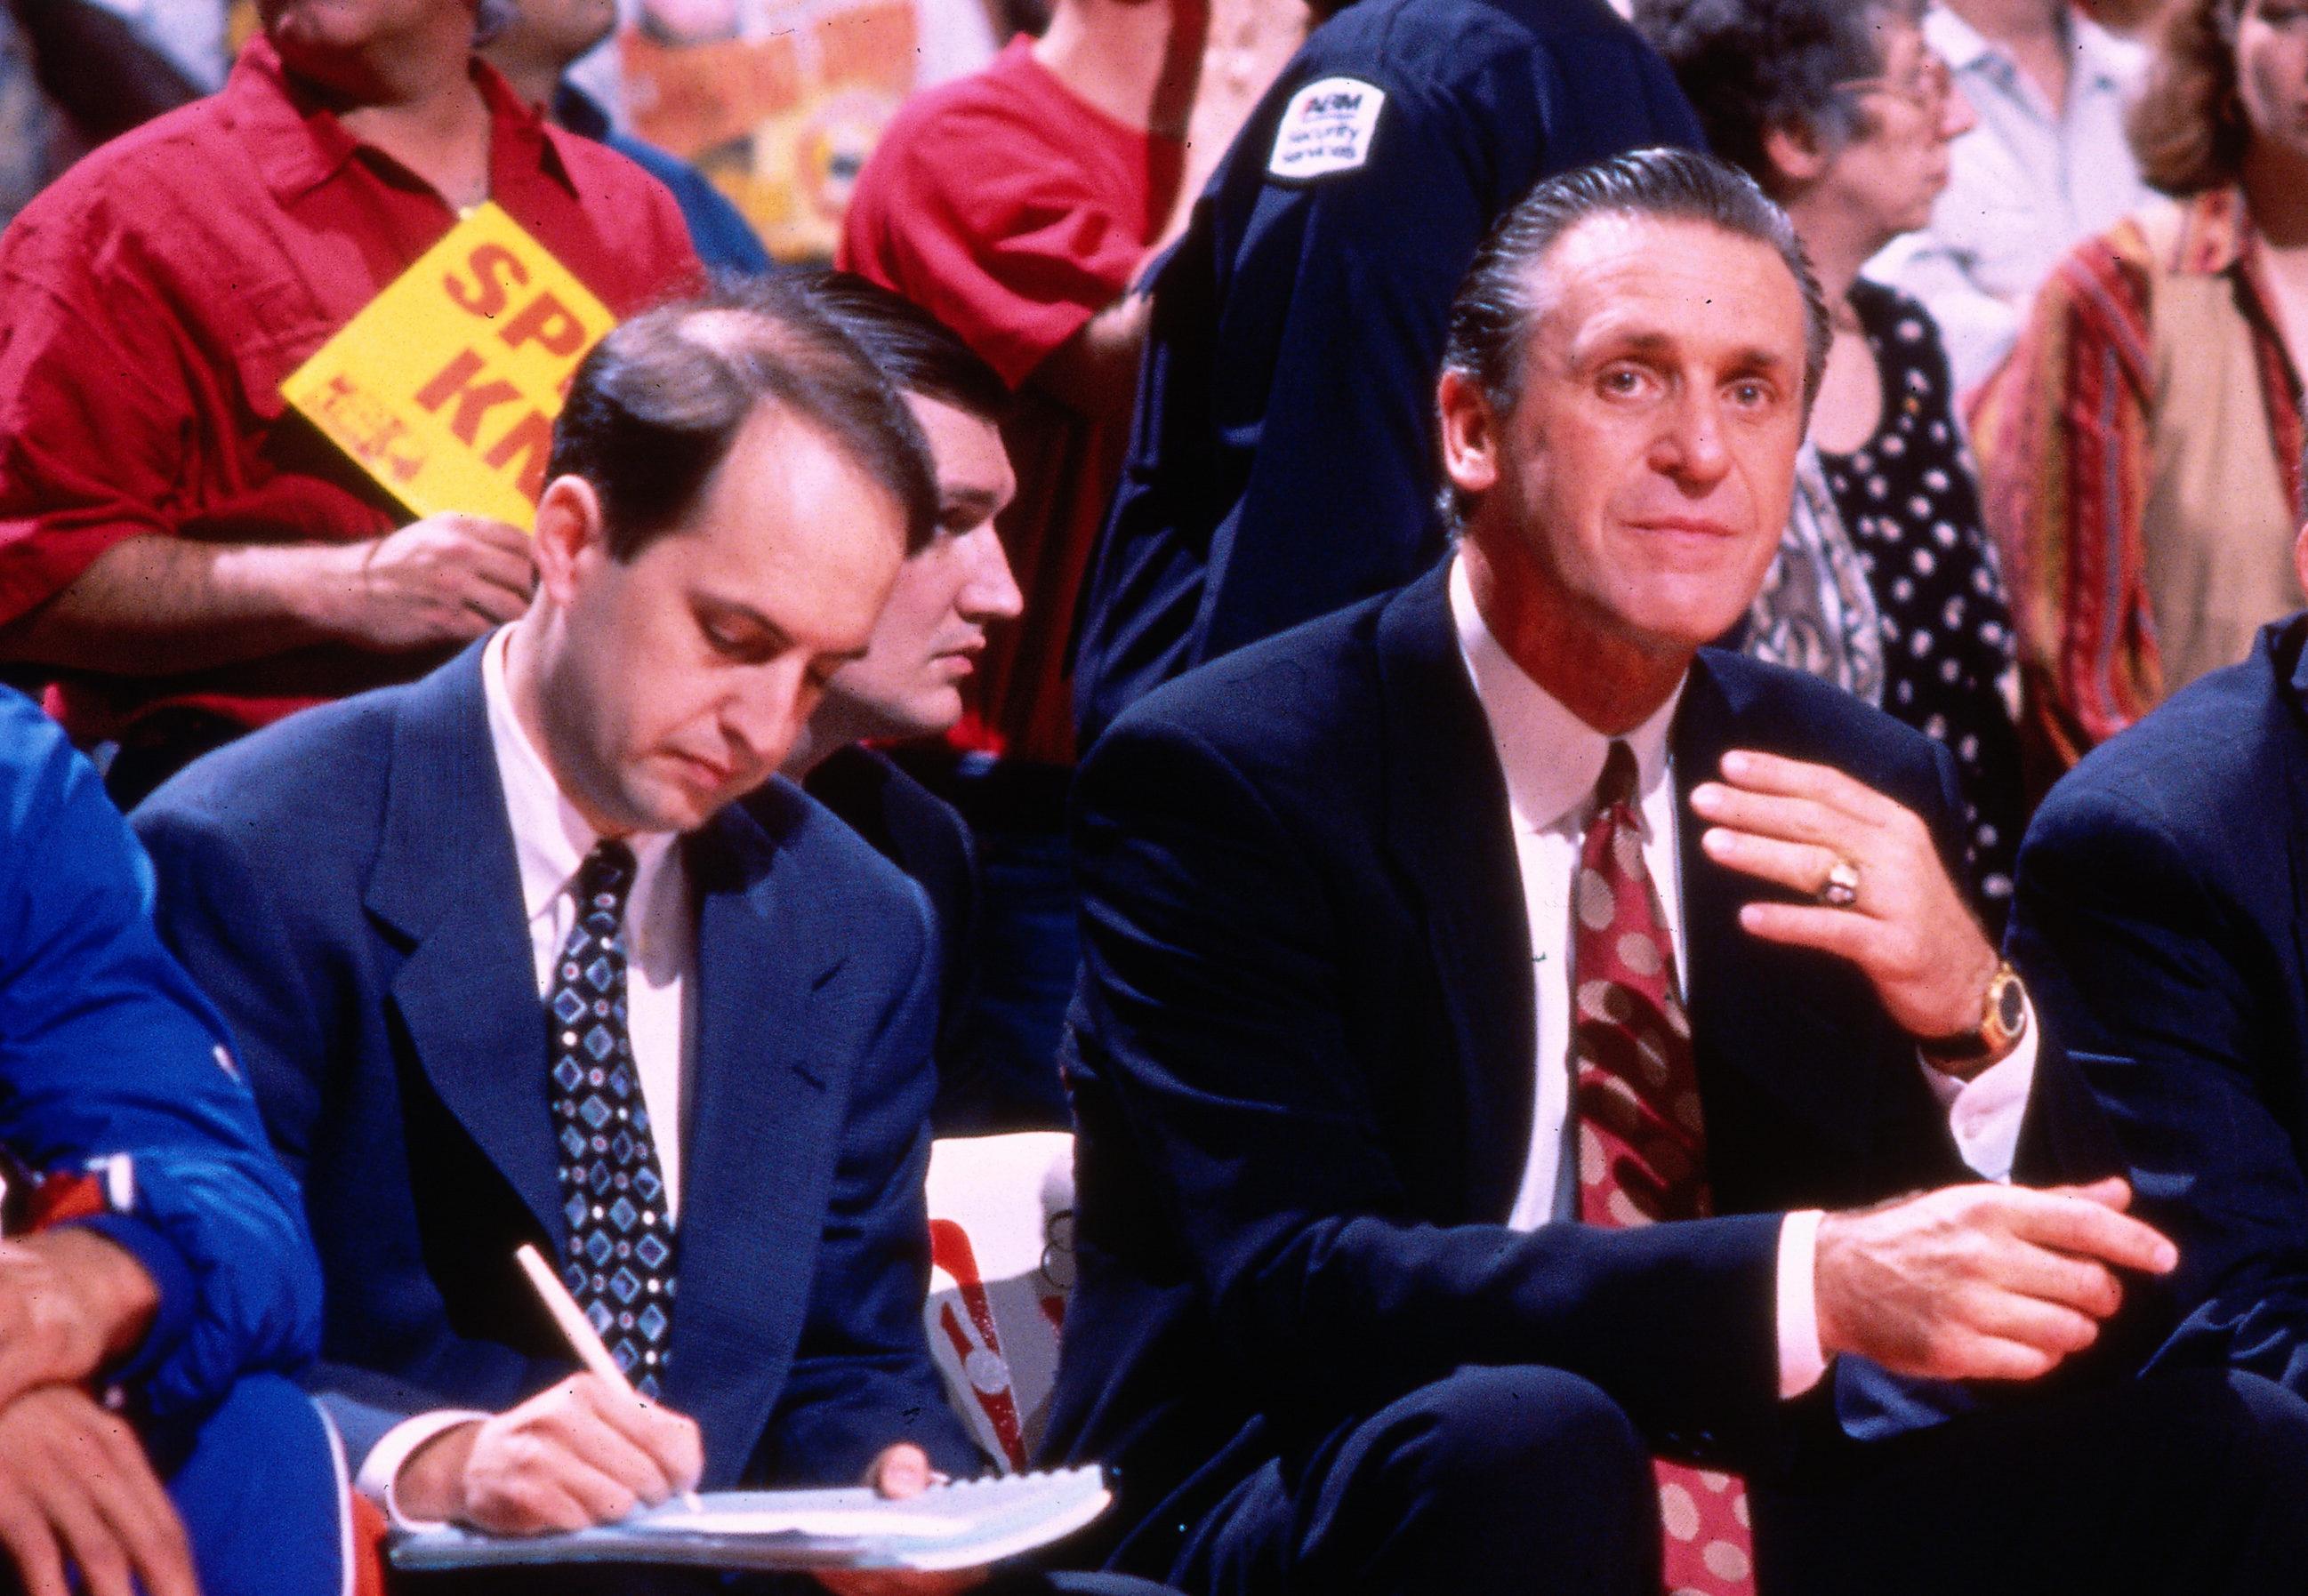 New York Knicks: Pat RIley